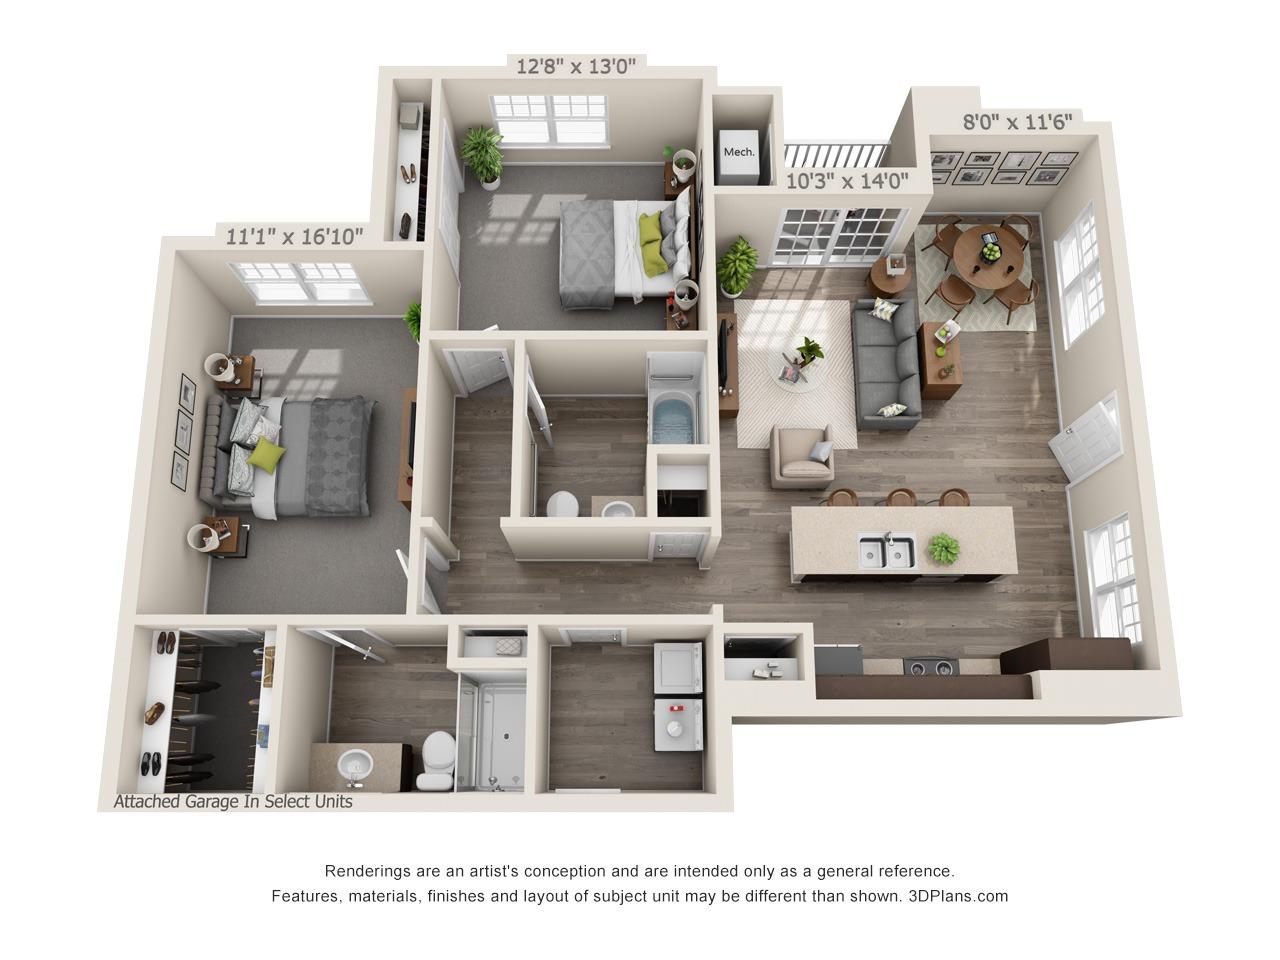 C1 - 2 Bed / 2 Bath - 1st Floor - 1,201 SF